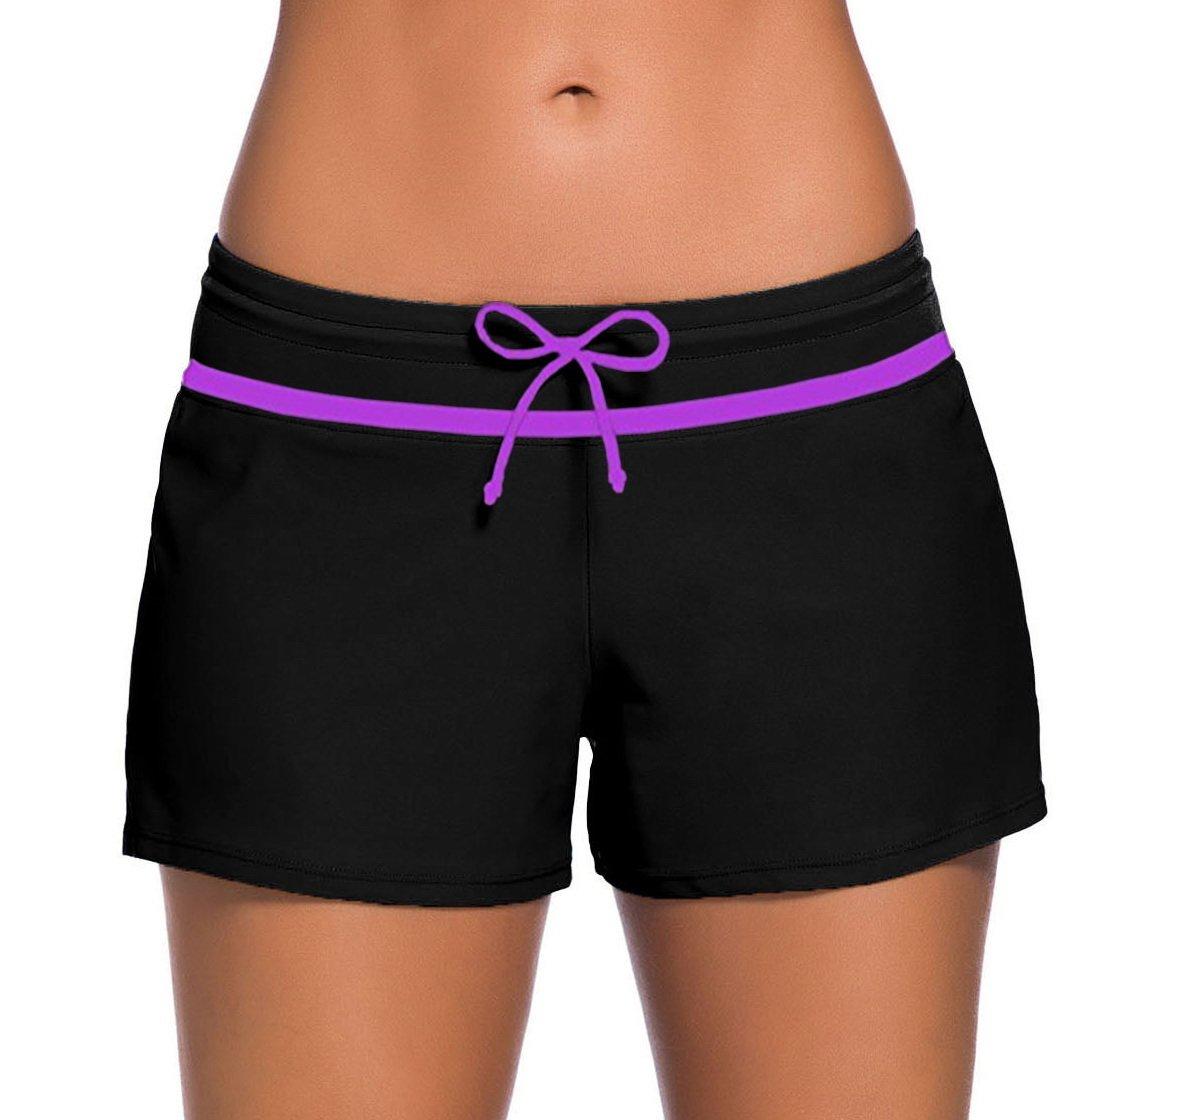 Sythyee Women's Swim Boardshorts Tankini Boyshorts Beach Bottom Swimsuit Built in Briefs Black & Purple Size XL